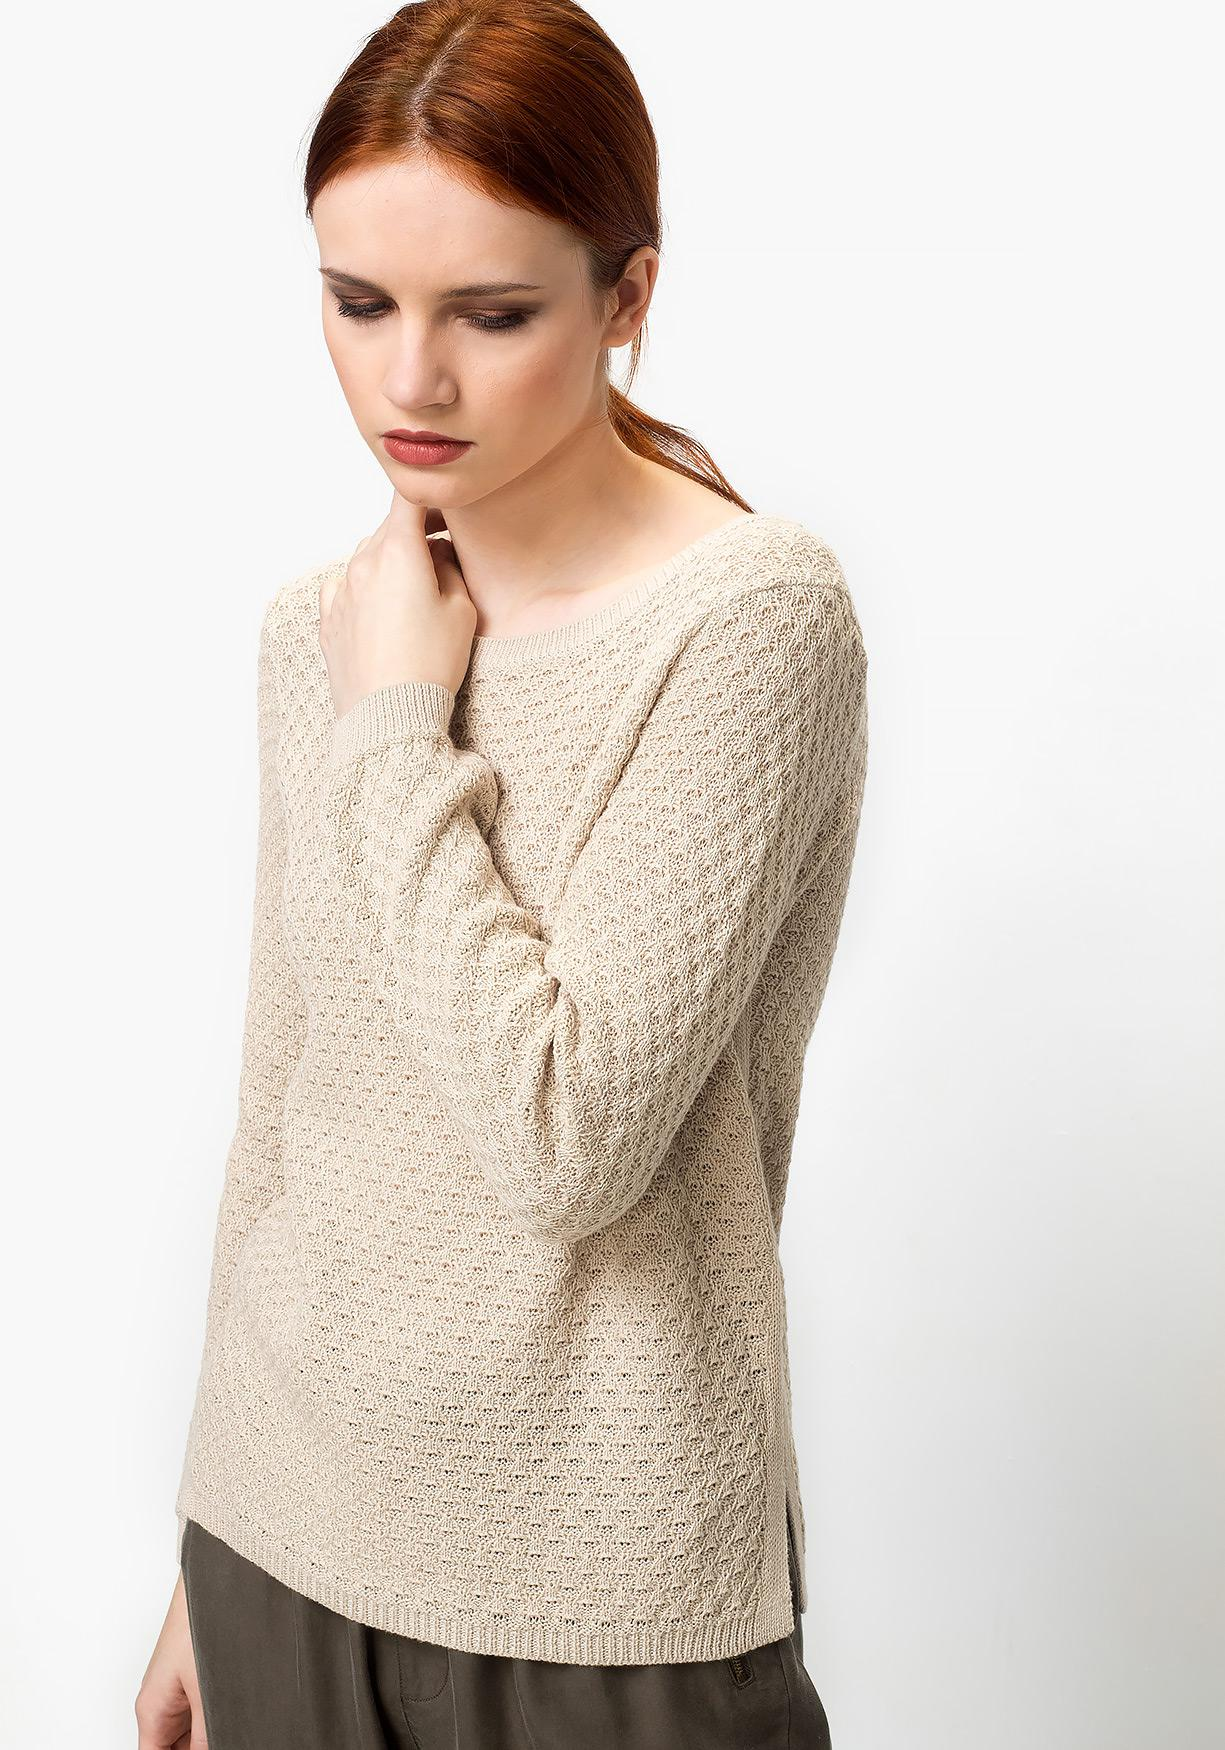 Comprar Jersey de mujer manga larga de punto TEX. ¡Aprovéchate de ... 71701ed2f418